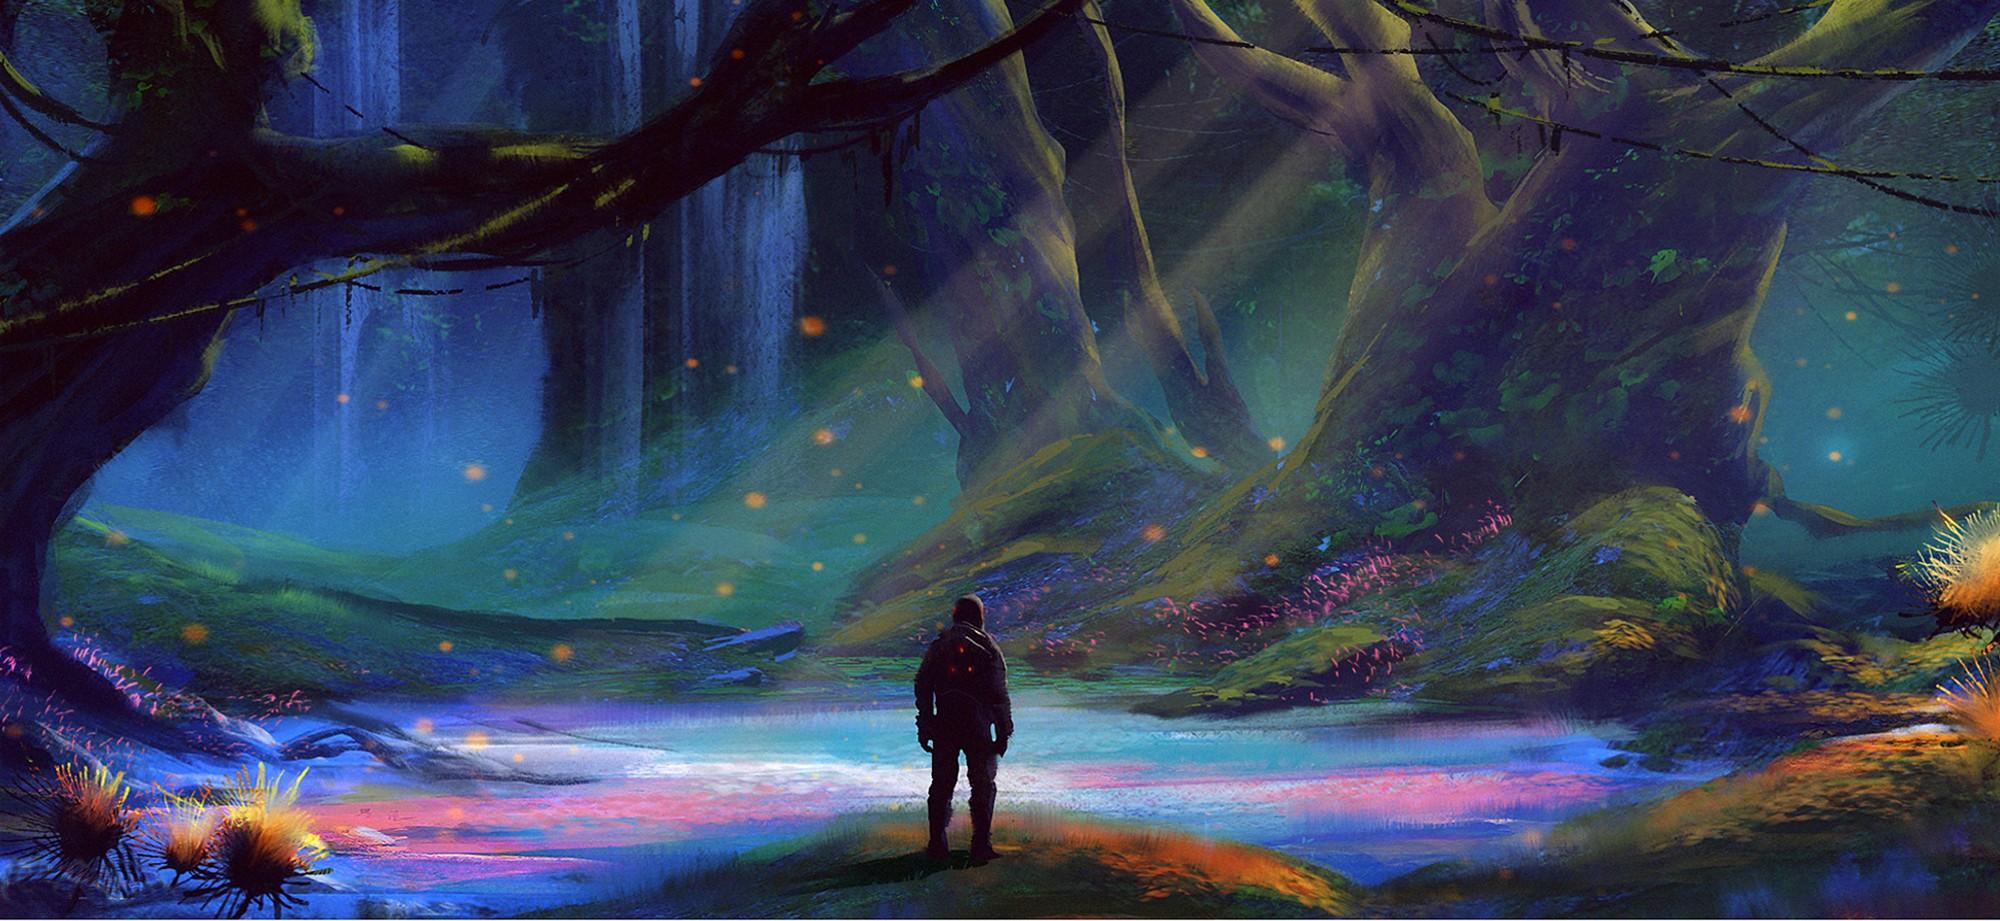 #artwork, #fantasy Art, #concept Art, #forest, #nature - Forest Gaia , HD Wallpaper & Backgrounds